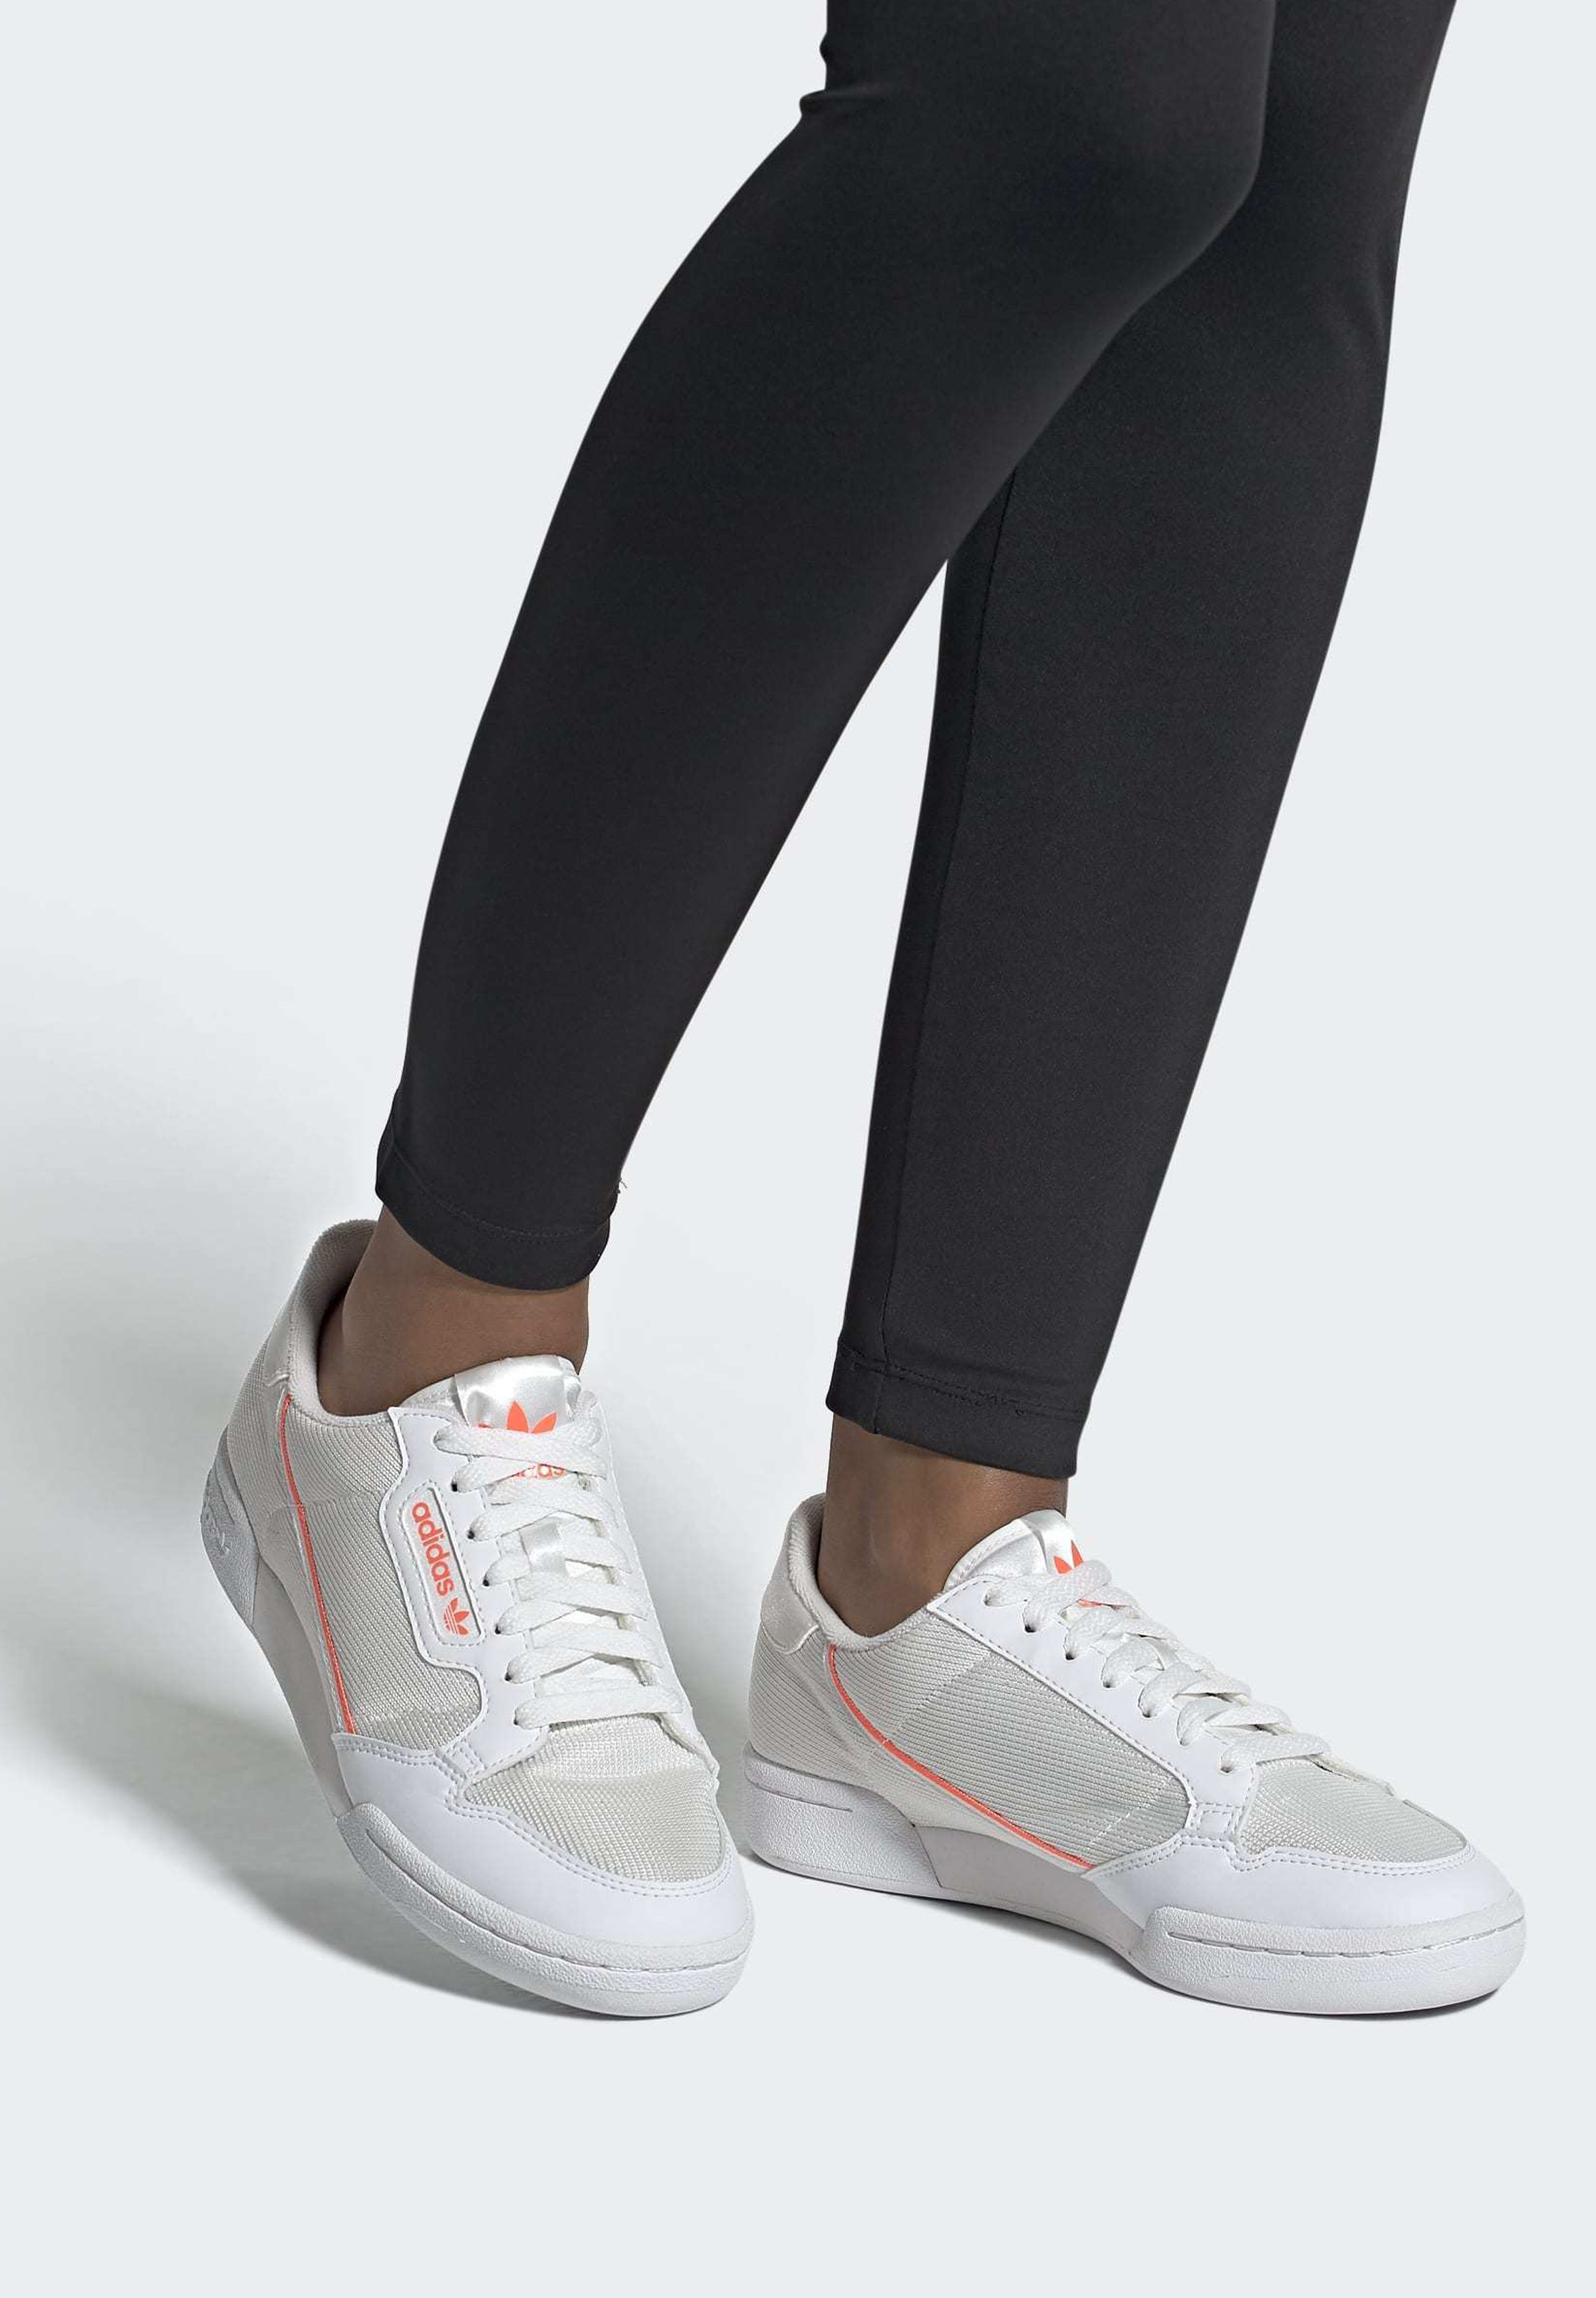 Gutes Angebot adidas Originals CONTINENTAL 80 SHOES - Sneaker low - white | Damenbekleidung 2020